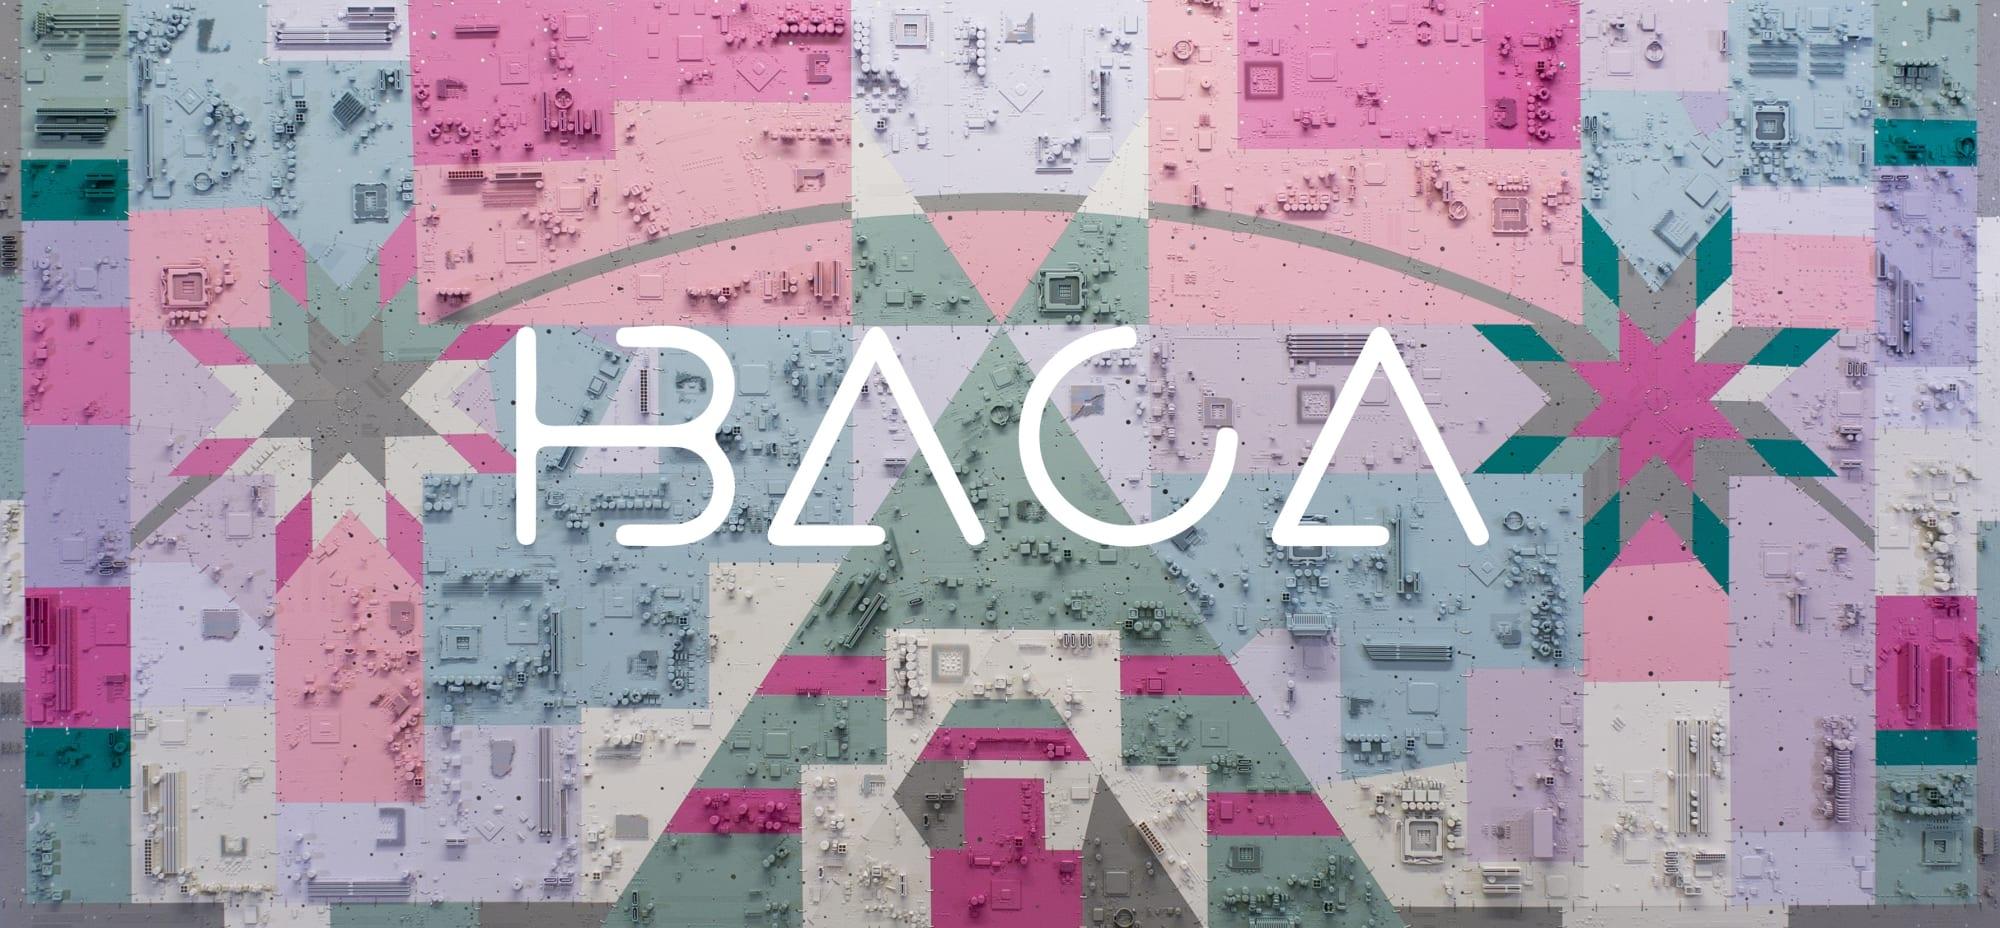 5th Contemporary Native Art Biennial (BACA 2020)